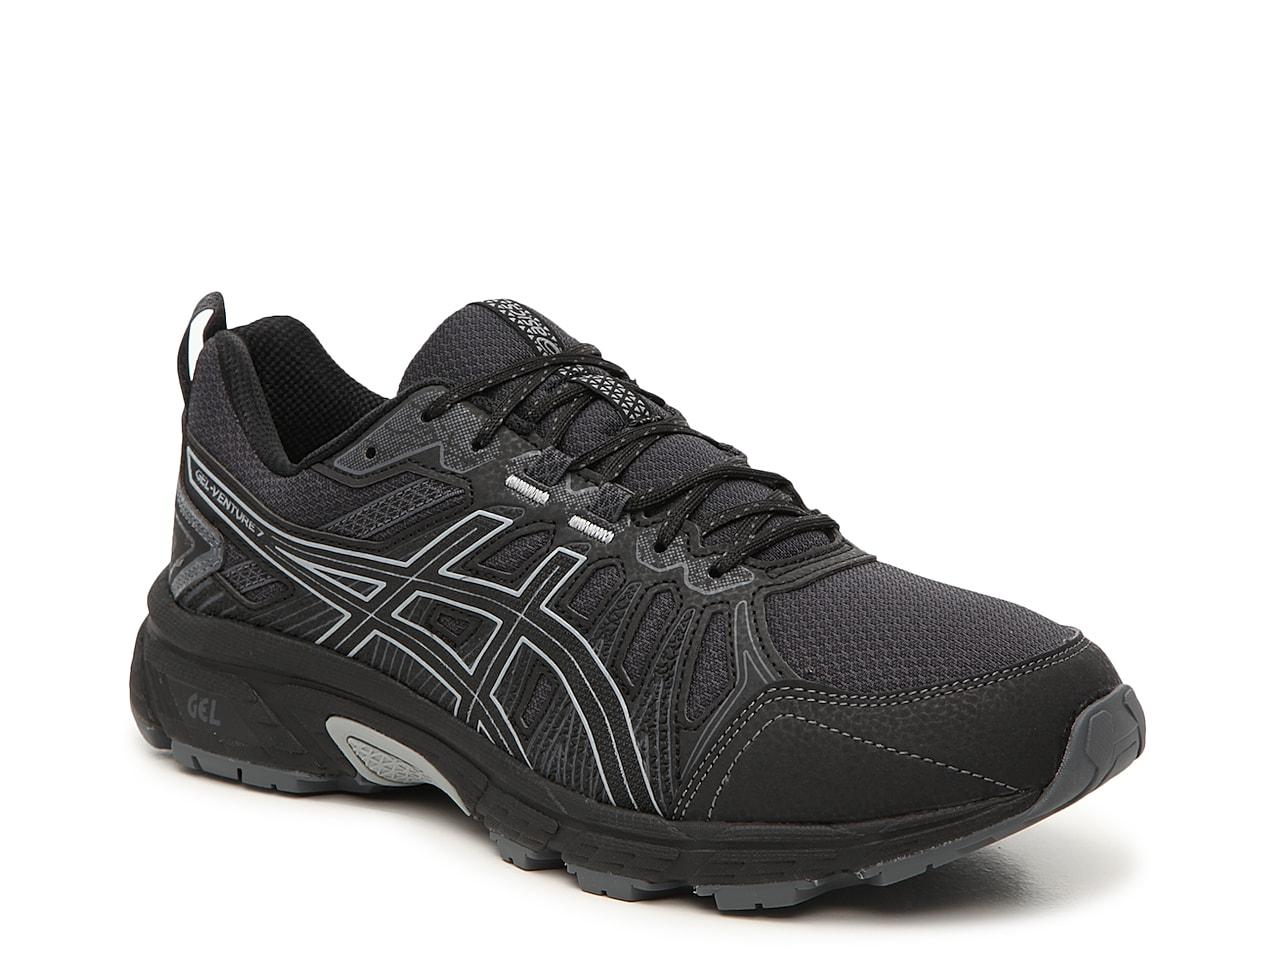 ASICS GEL-Venture 7 Trail Running Shoe - Men's